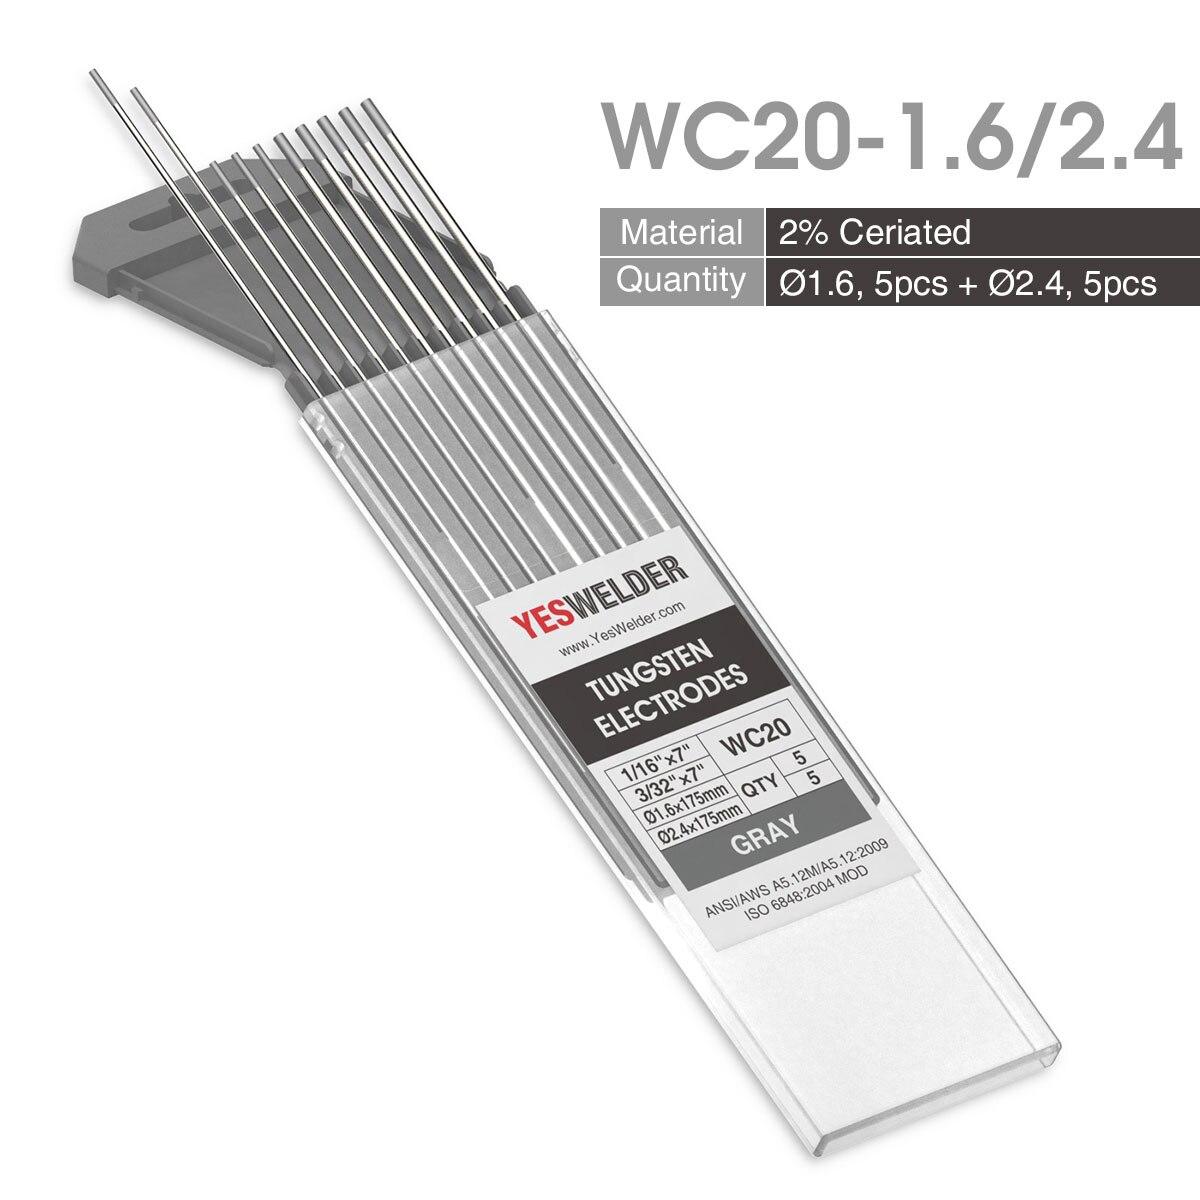 Yesseller 10-pk TIG сварочный вольфрамовый электрод WP/WT20/WC20/WL15/WL20/WX - Цвет: WC20-1.6-2.4